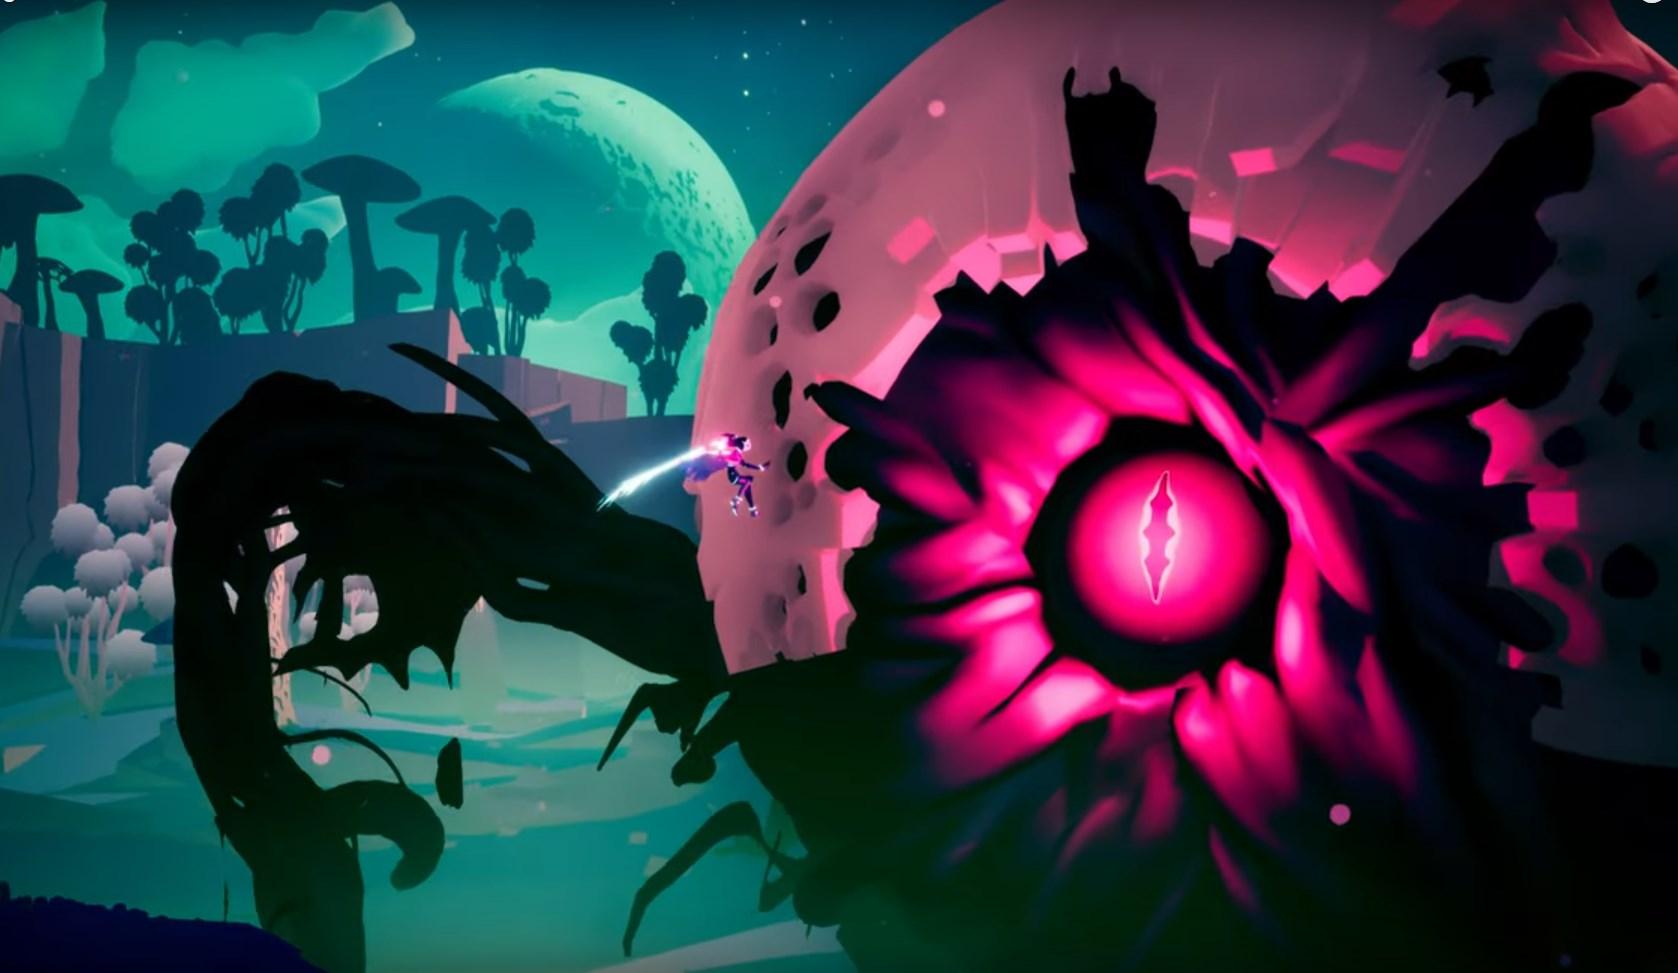 Hyper Light Drifter Studio Reveals Its New Game Solar Ash Kingdom